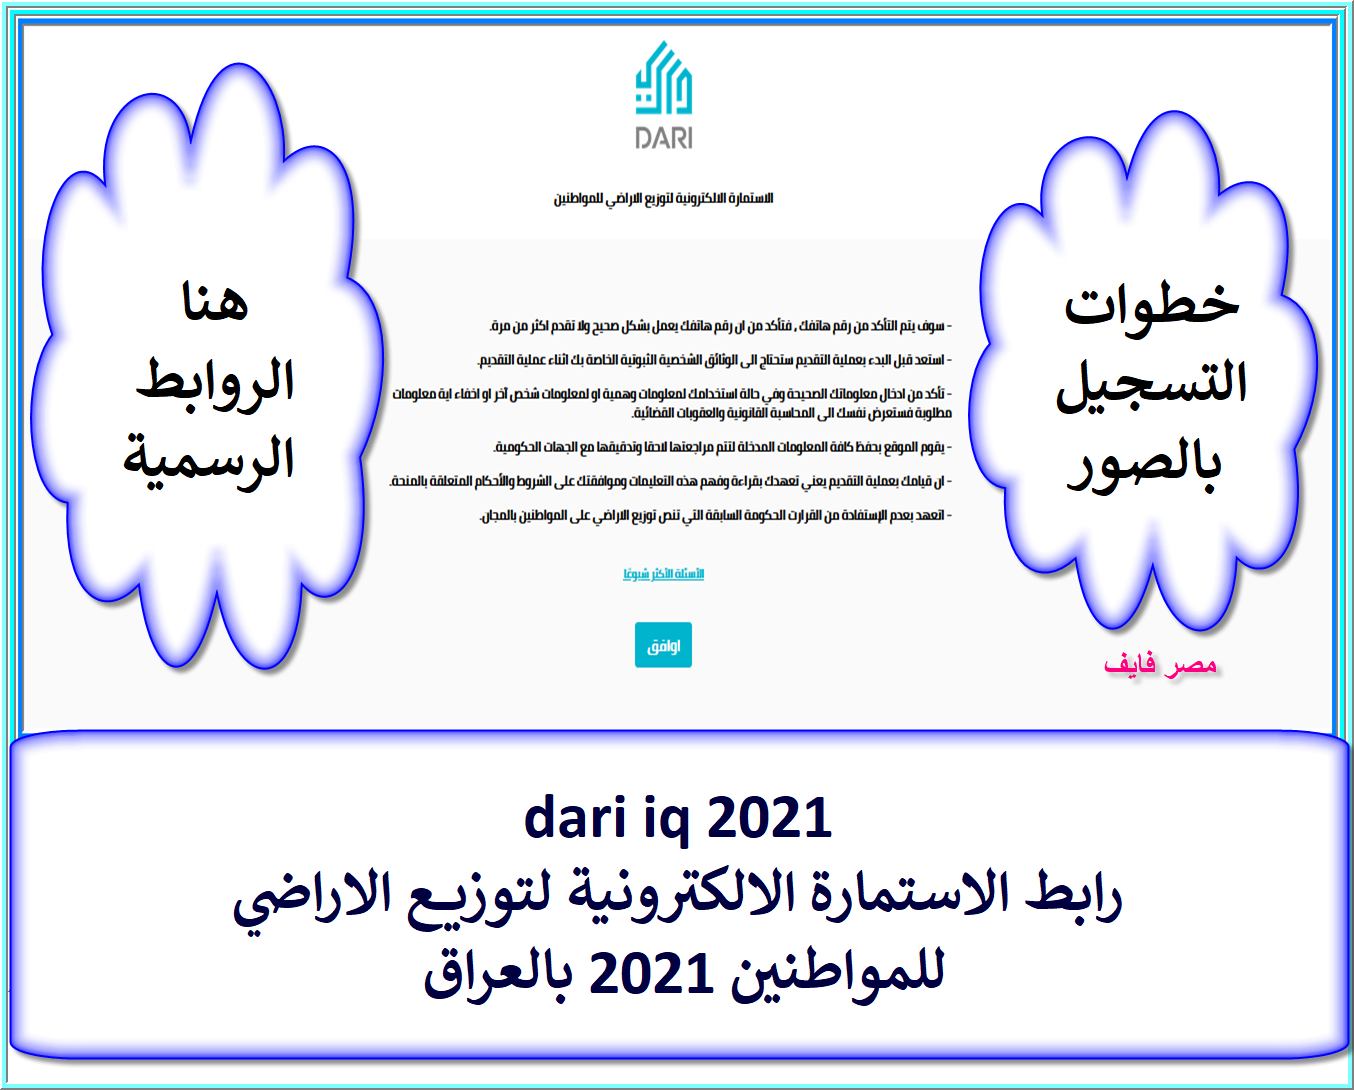 dari iq 2021 رابط الاستمارة الإلكترونية لتوزيع الأراضي للمواطنين2021 بالعراق الخطوات والروابط الرسمية